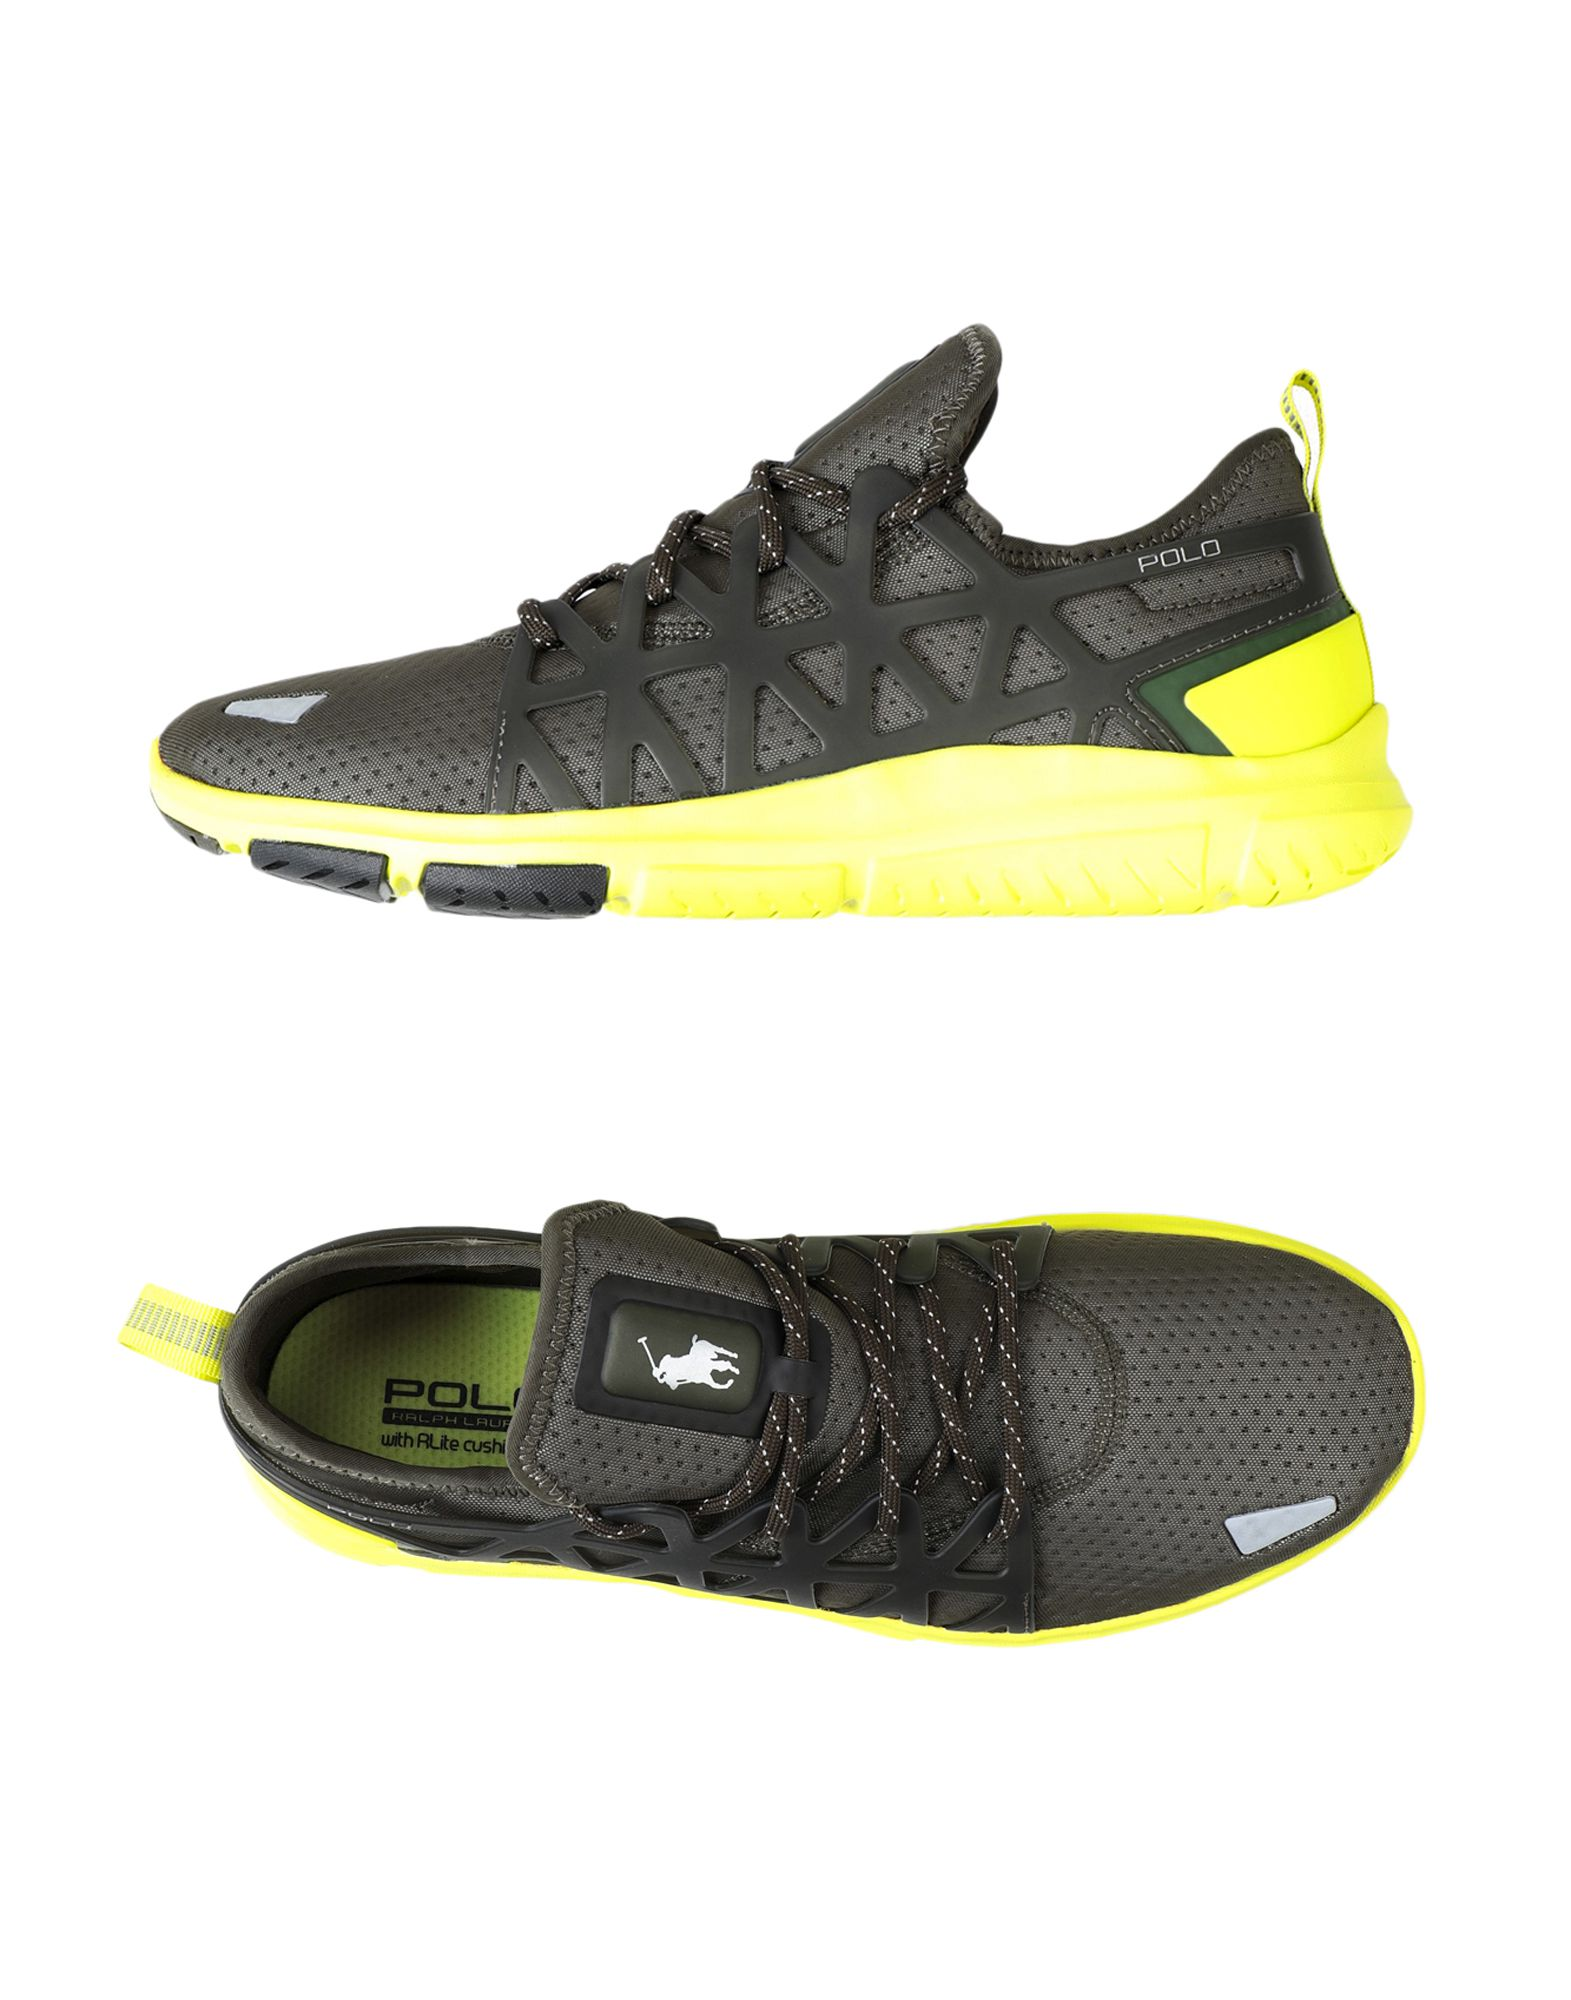 Polo Ralph Lauren Sneakers Herren 11544698FF  11544698FF Herren Gute Qualität beliebte Schuhe 792a67